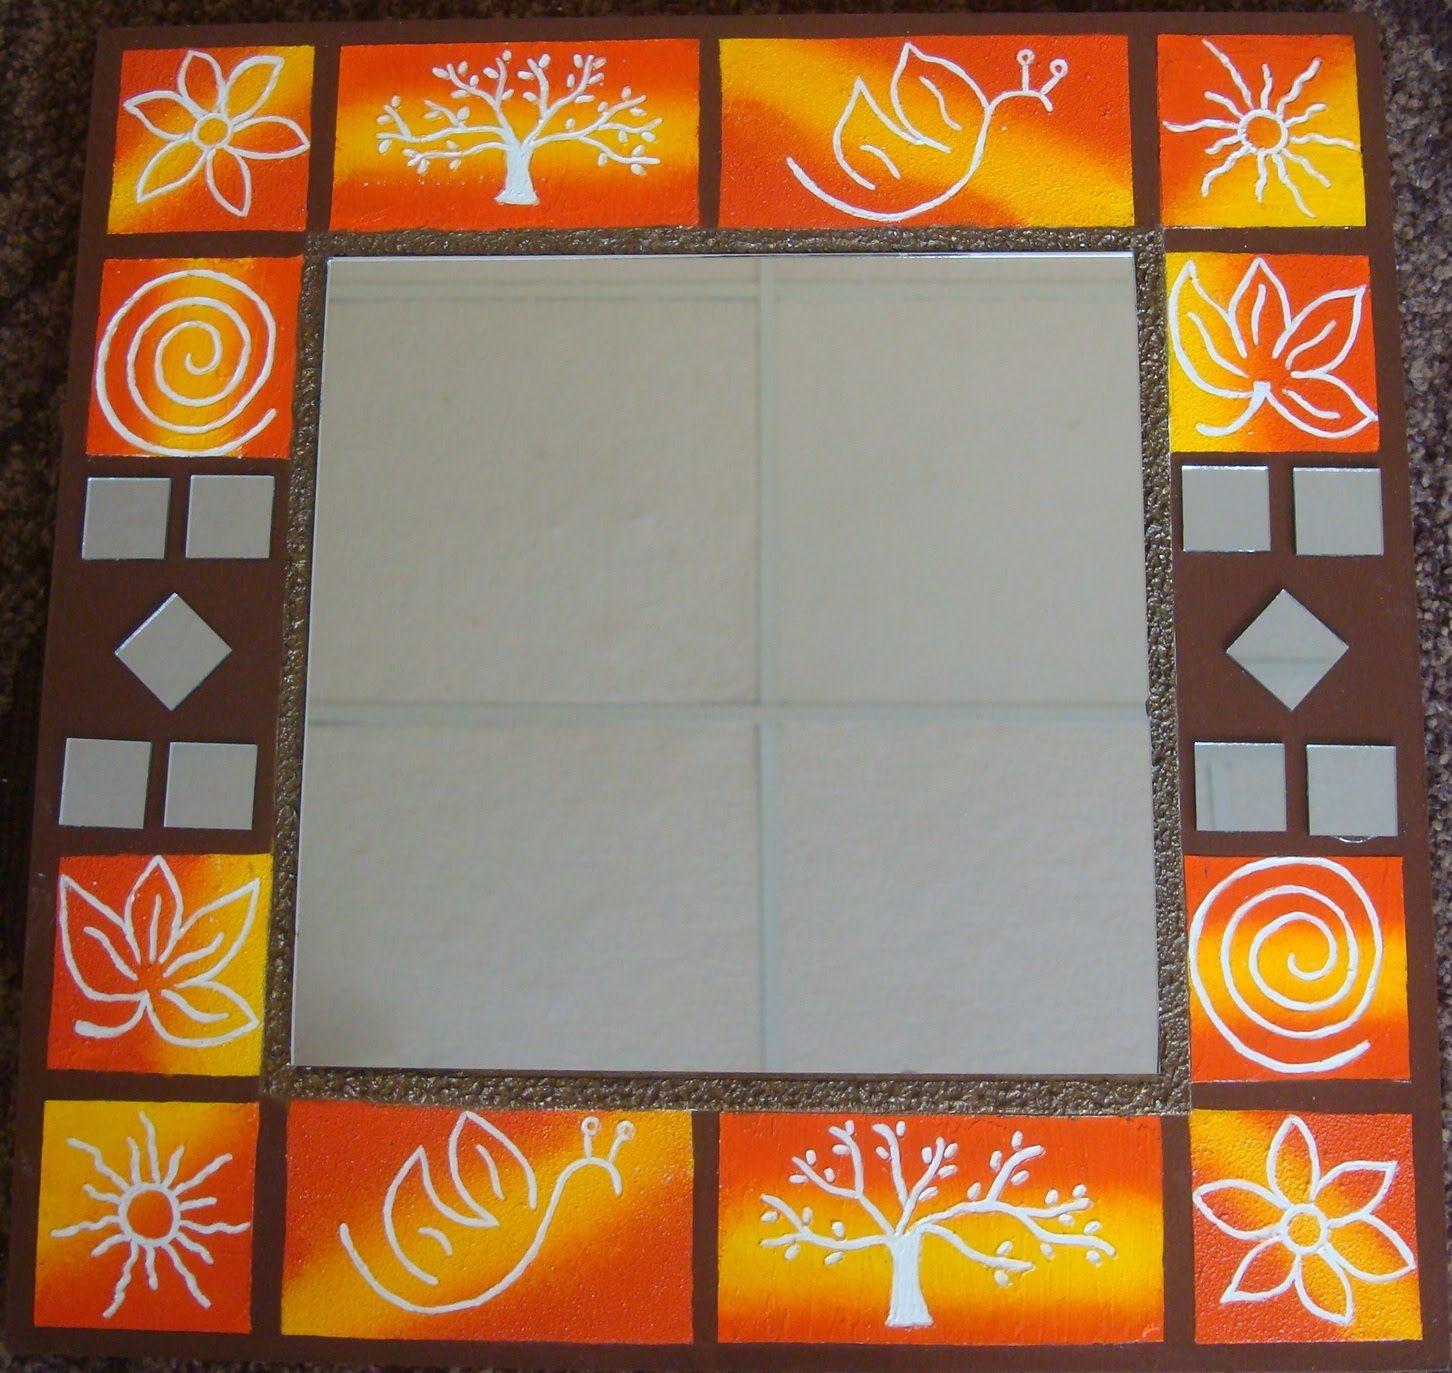 Manualidades espejo con textura de trupan by taller - Espejos para manualidades ...